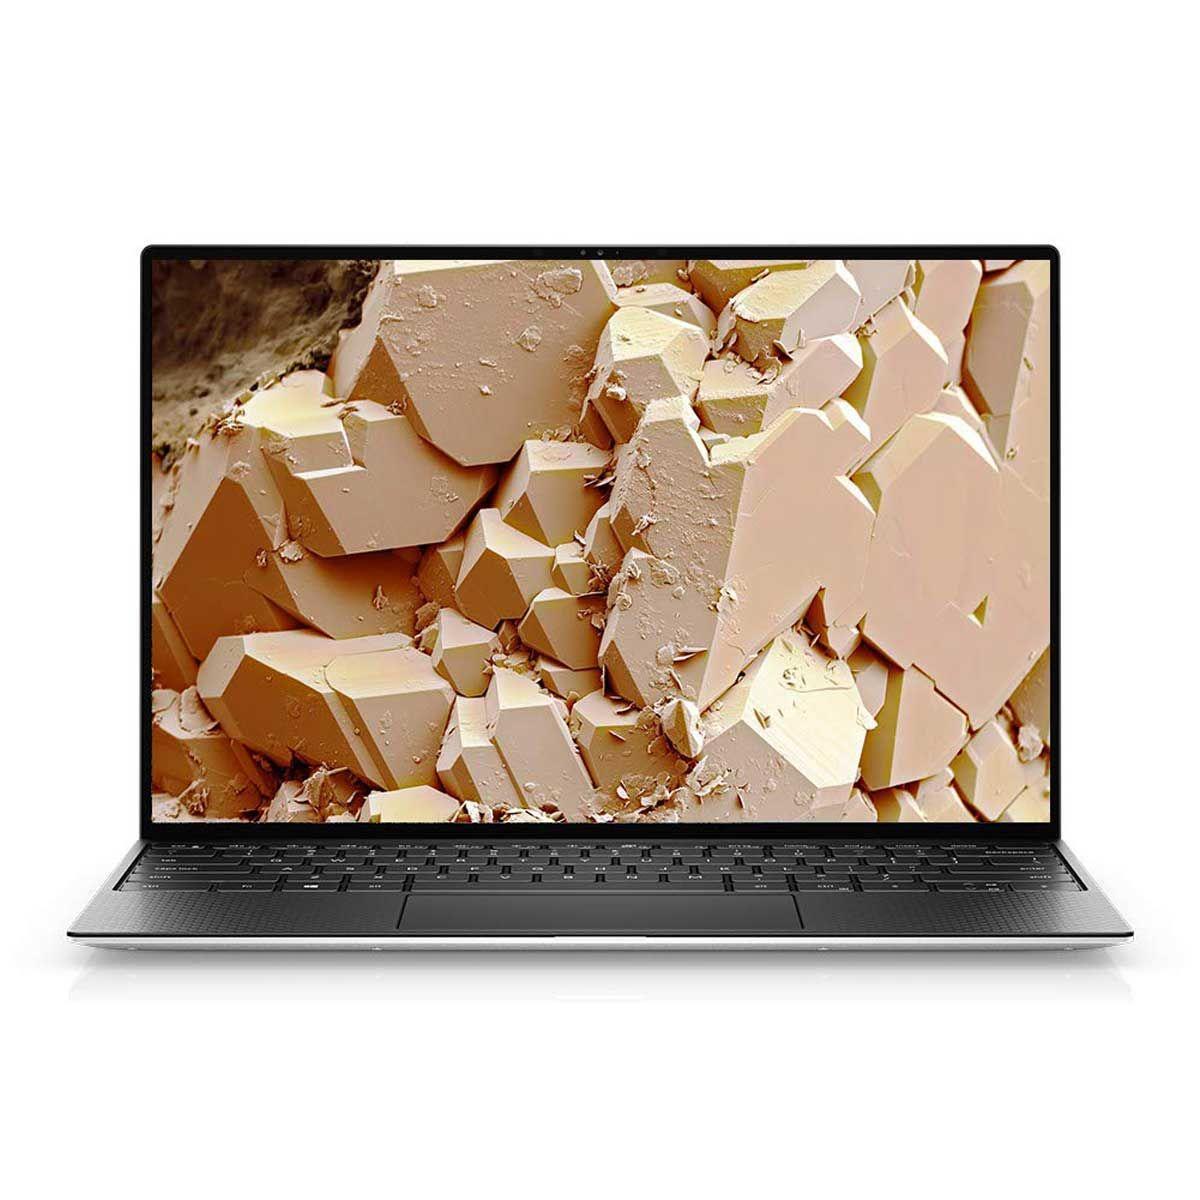 Dell XPS 9310 11th Gen Core i5-1135G7 (2021)